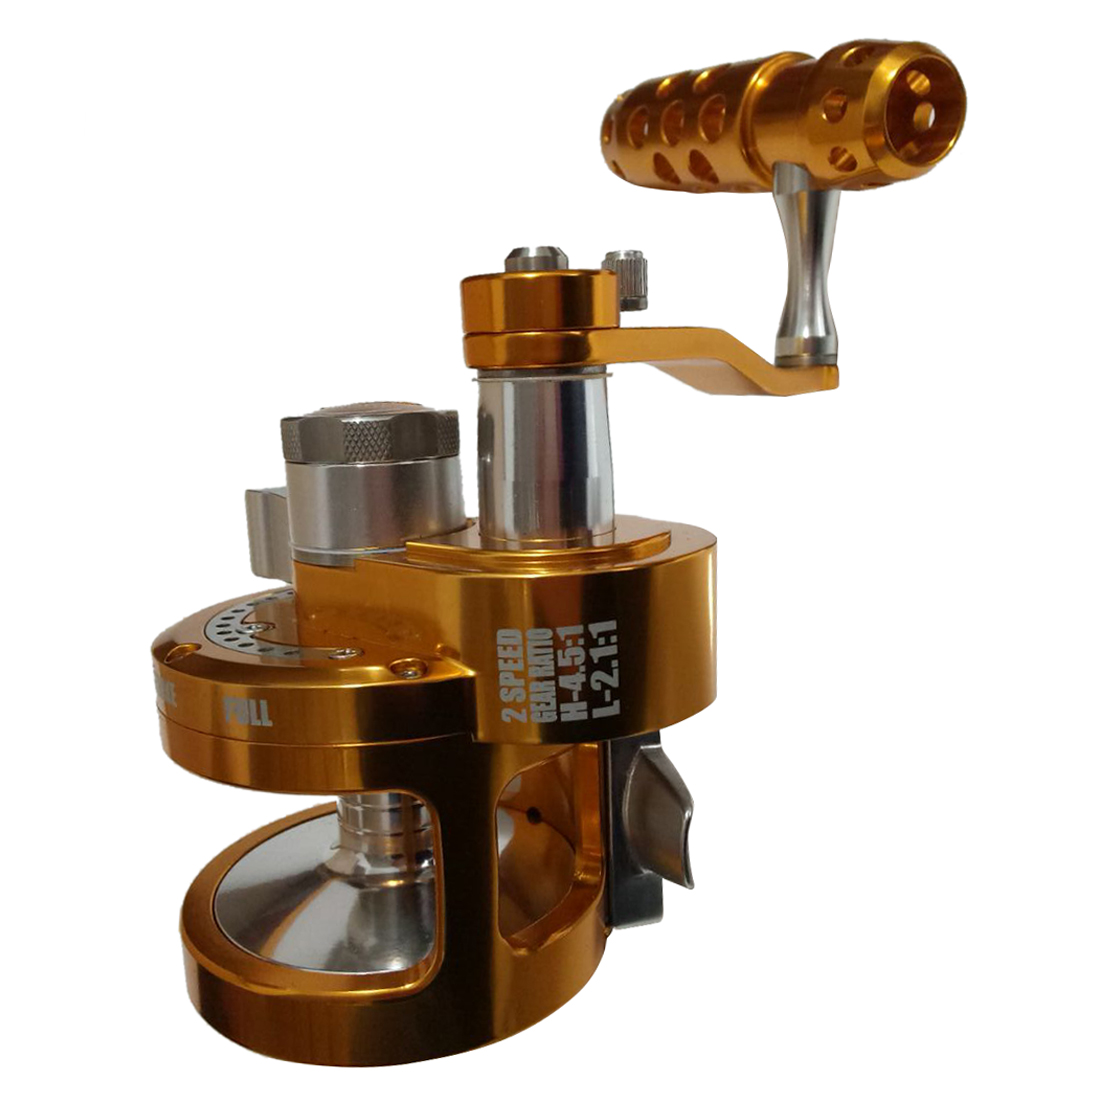 HLES Full Metal Reel Double Speed Trolling Fishing Reel 30kgs Power Drag Deep Sea Saltwater Boat Reel SYD70 4.5:1 2.1:1 left